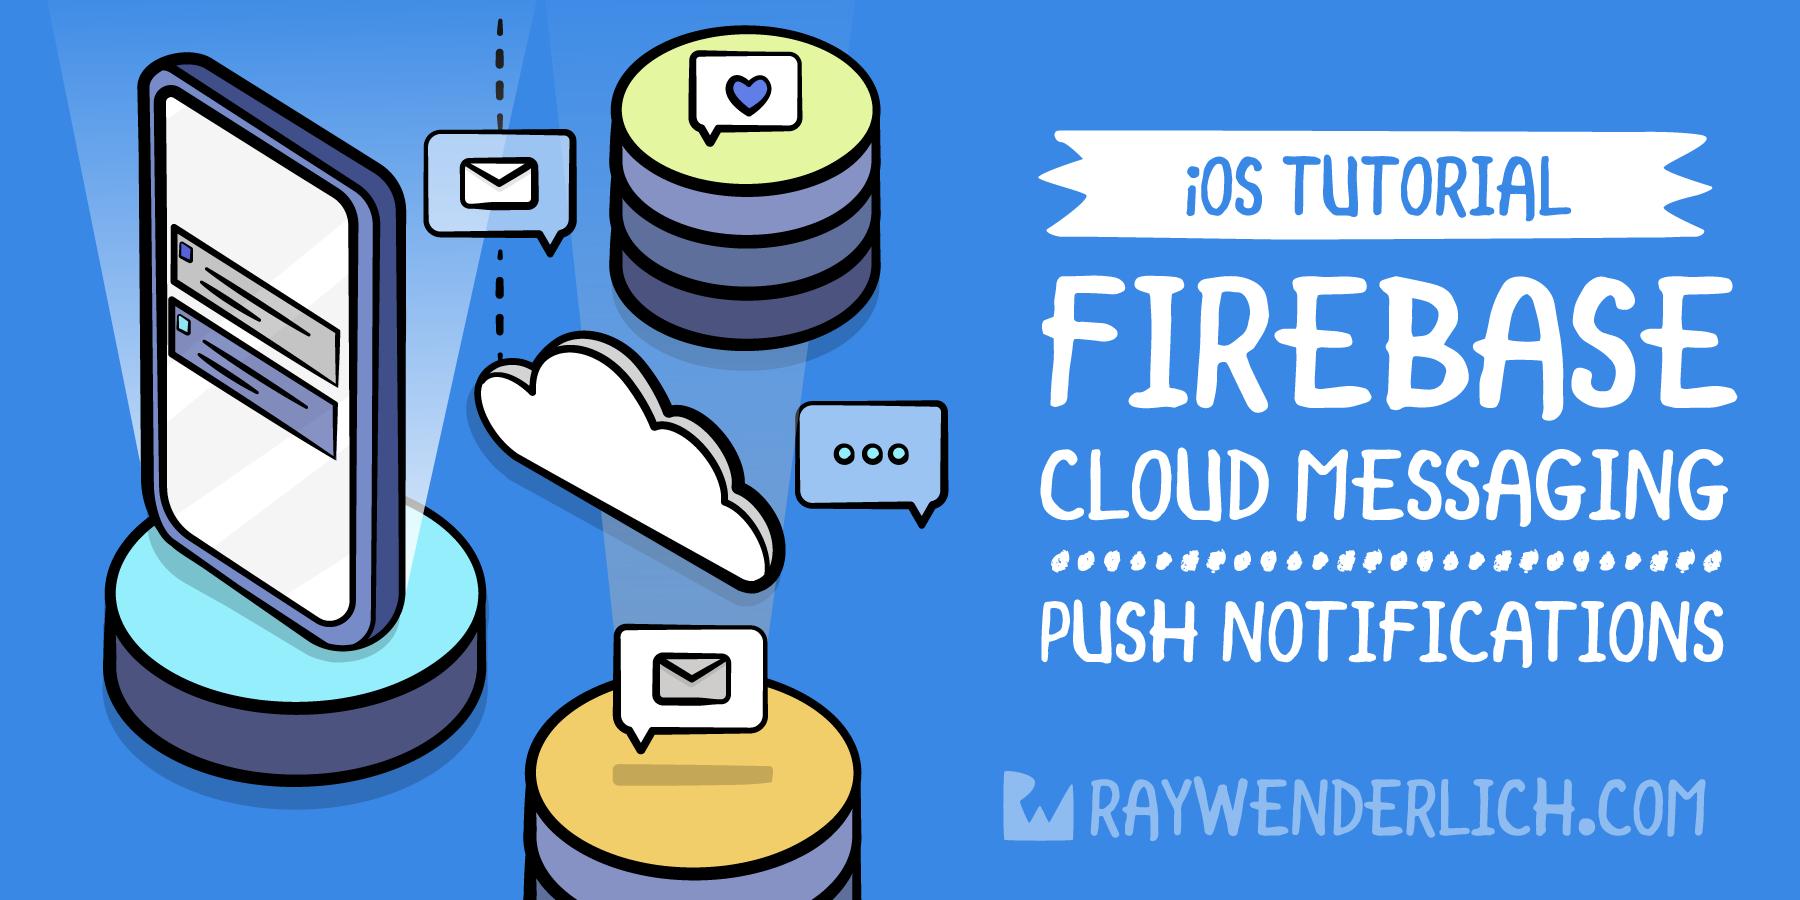 Firebase Cloud Messaging for iOS: Push Notifications [FREE]